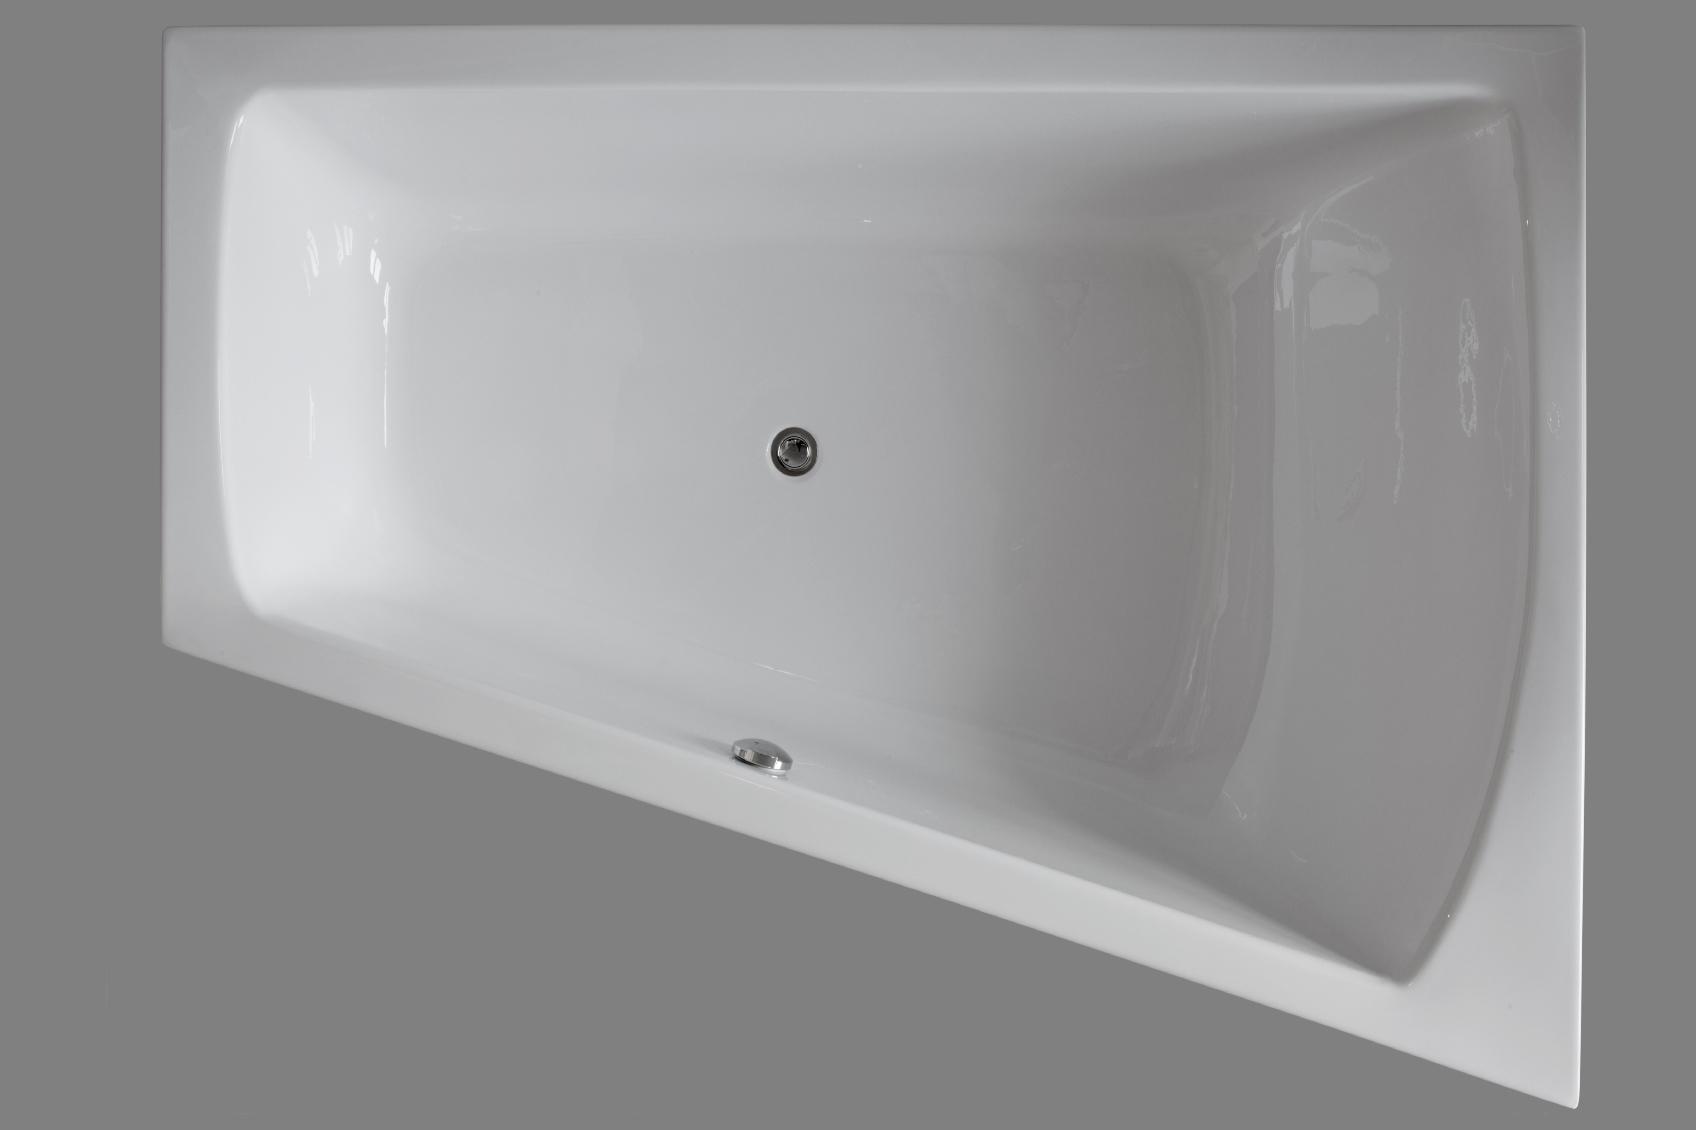 raumsparwanne badewanne galatea coast 180 x 130 x 45 cm links ct180 130u ebay. Black Bedroom Furniture Sets. Home Design Ideas